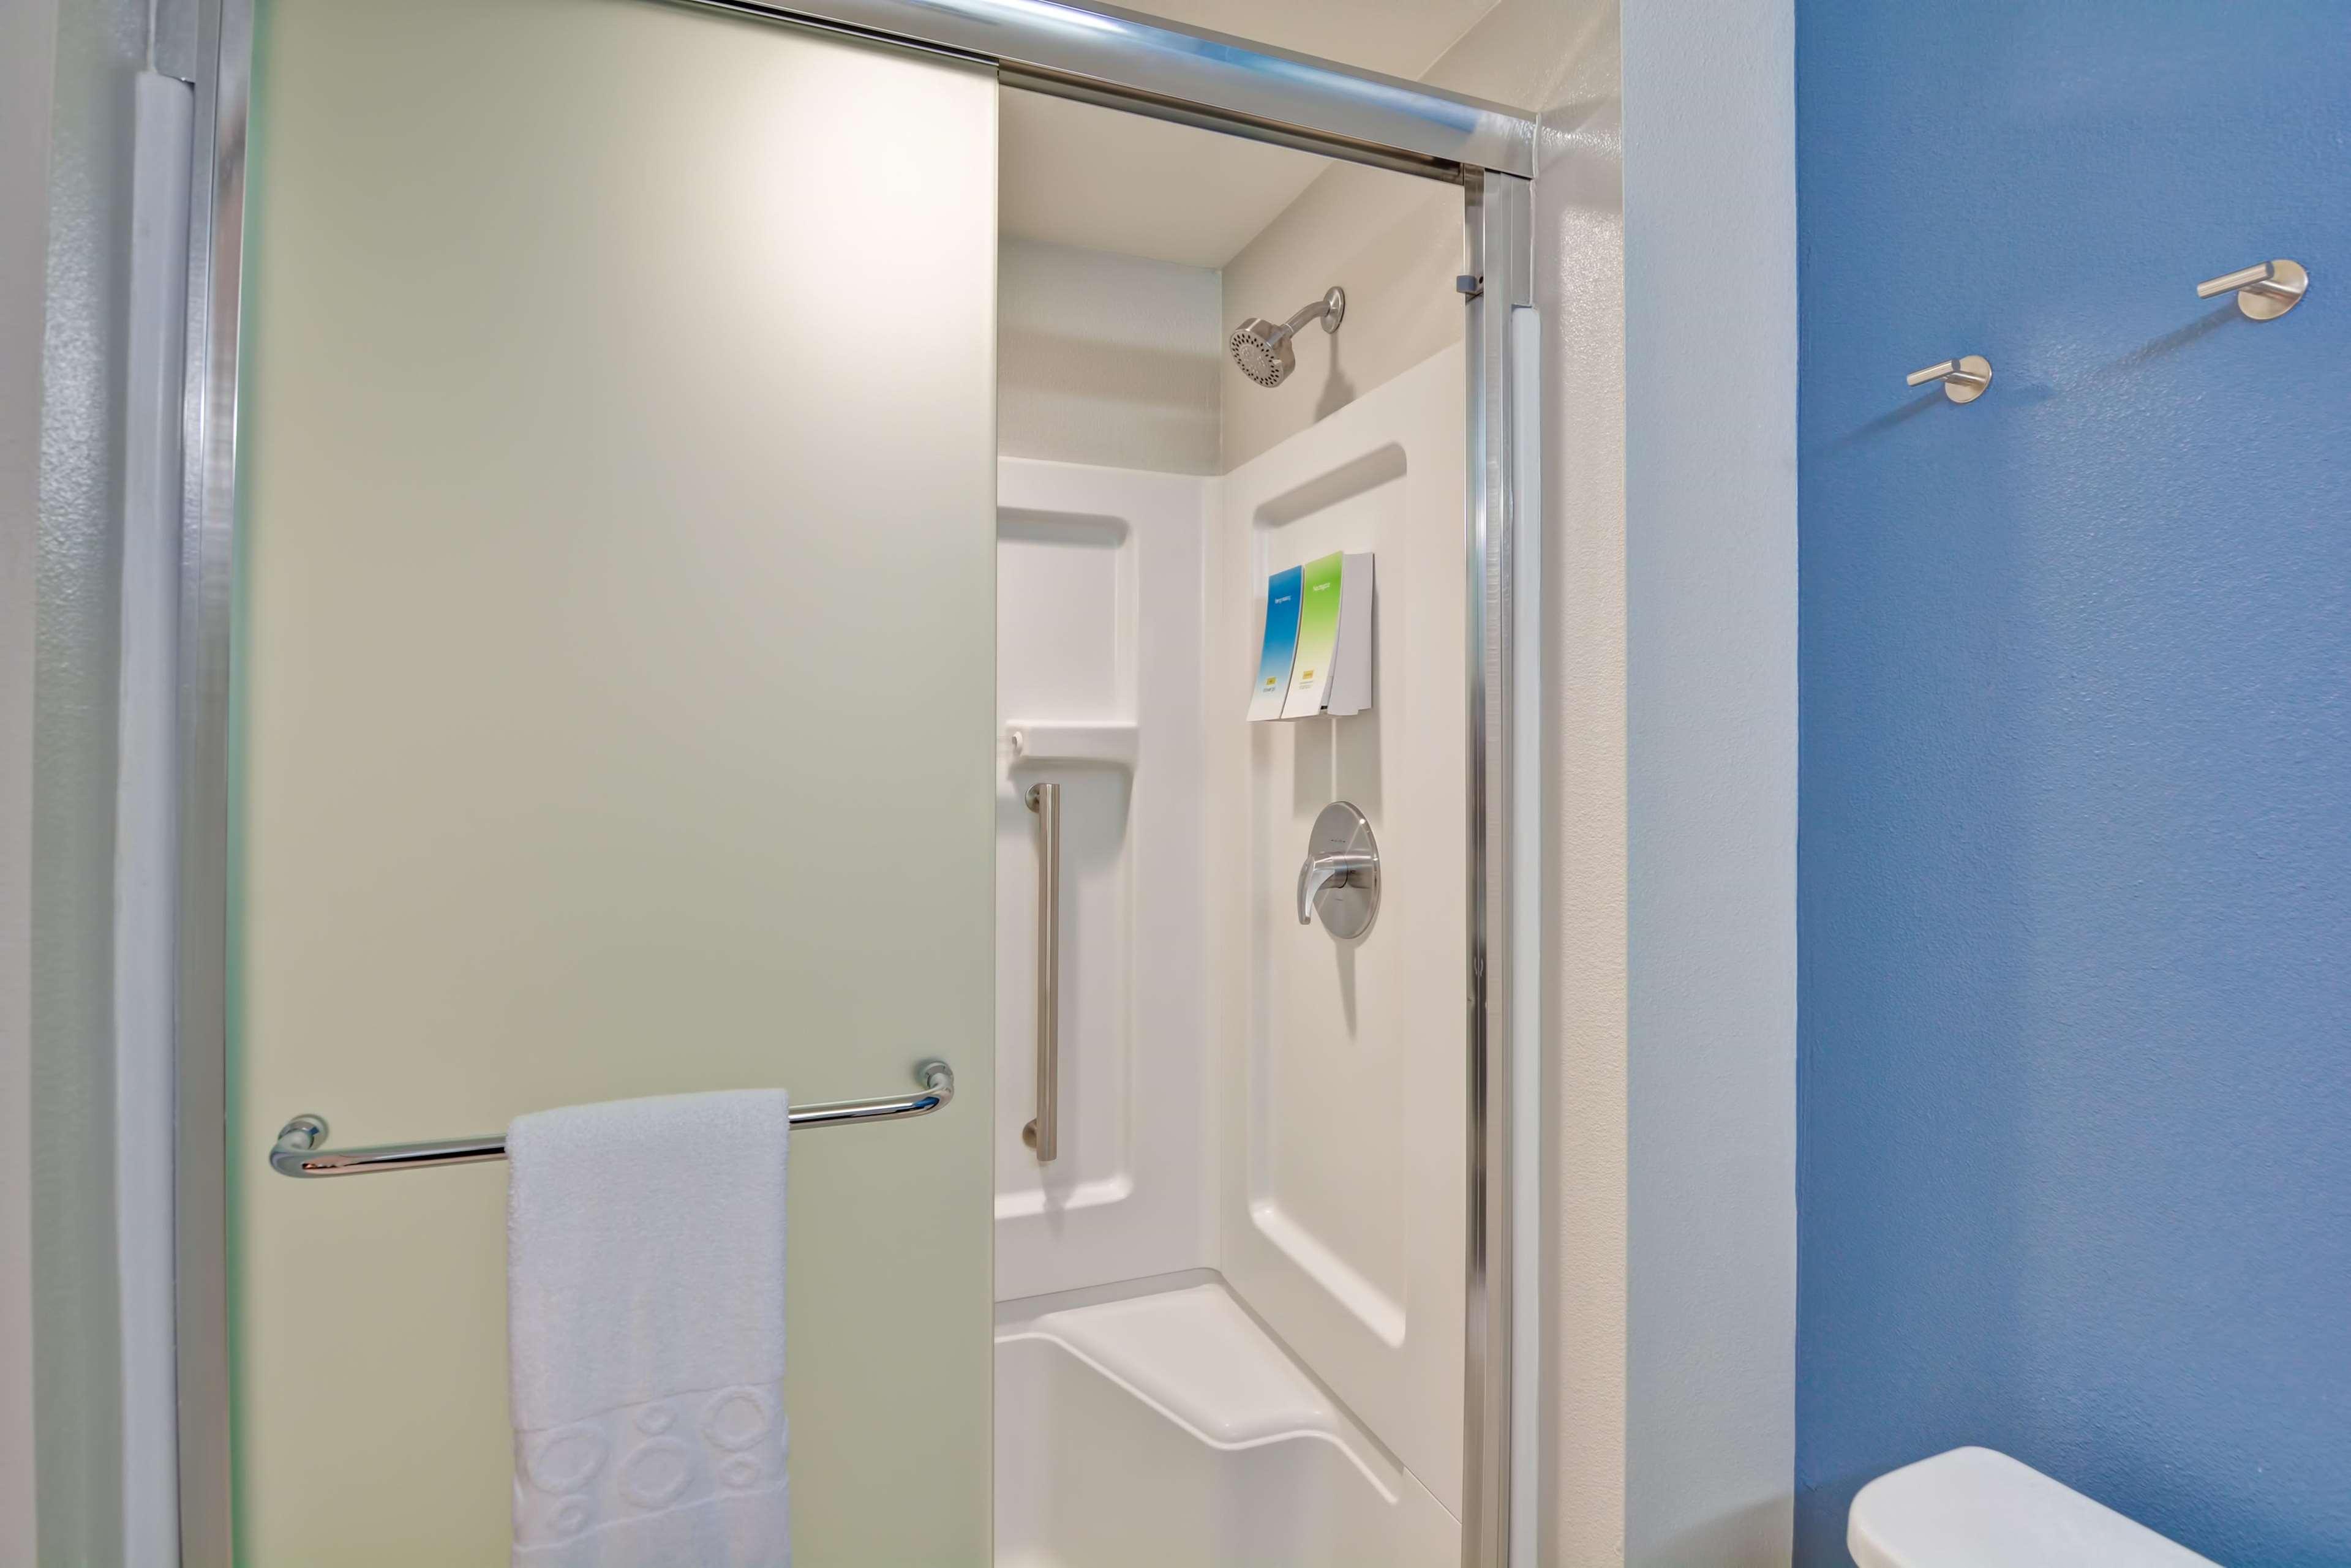 Home2 Suites by Hilton Azusa image 27